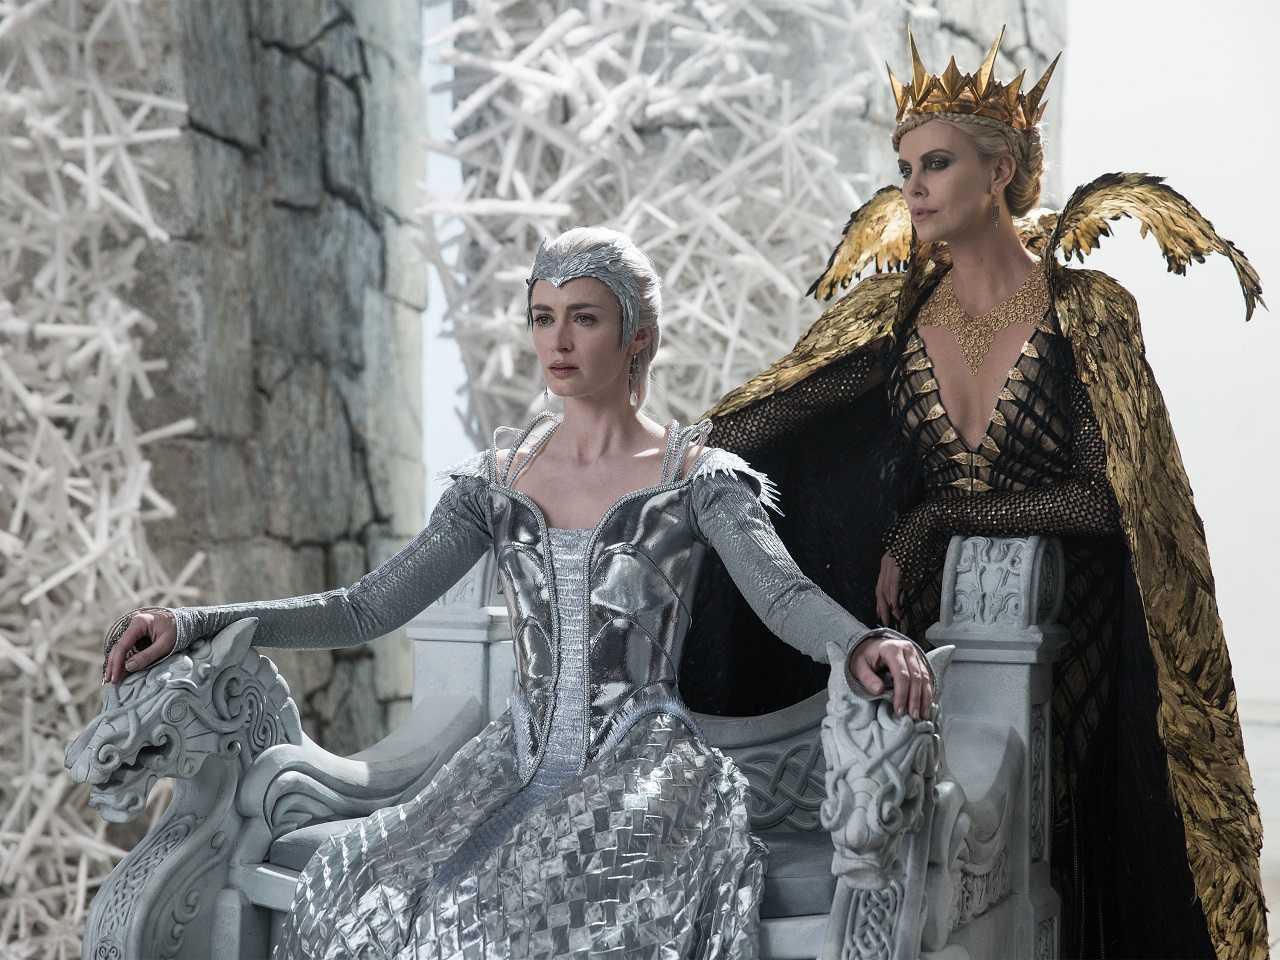 Queen Freya (Emily Blunt) and Queen Ravenna (Charlize Theron) in The Huntsman Winter's War (2016)